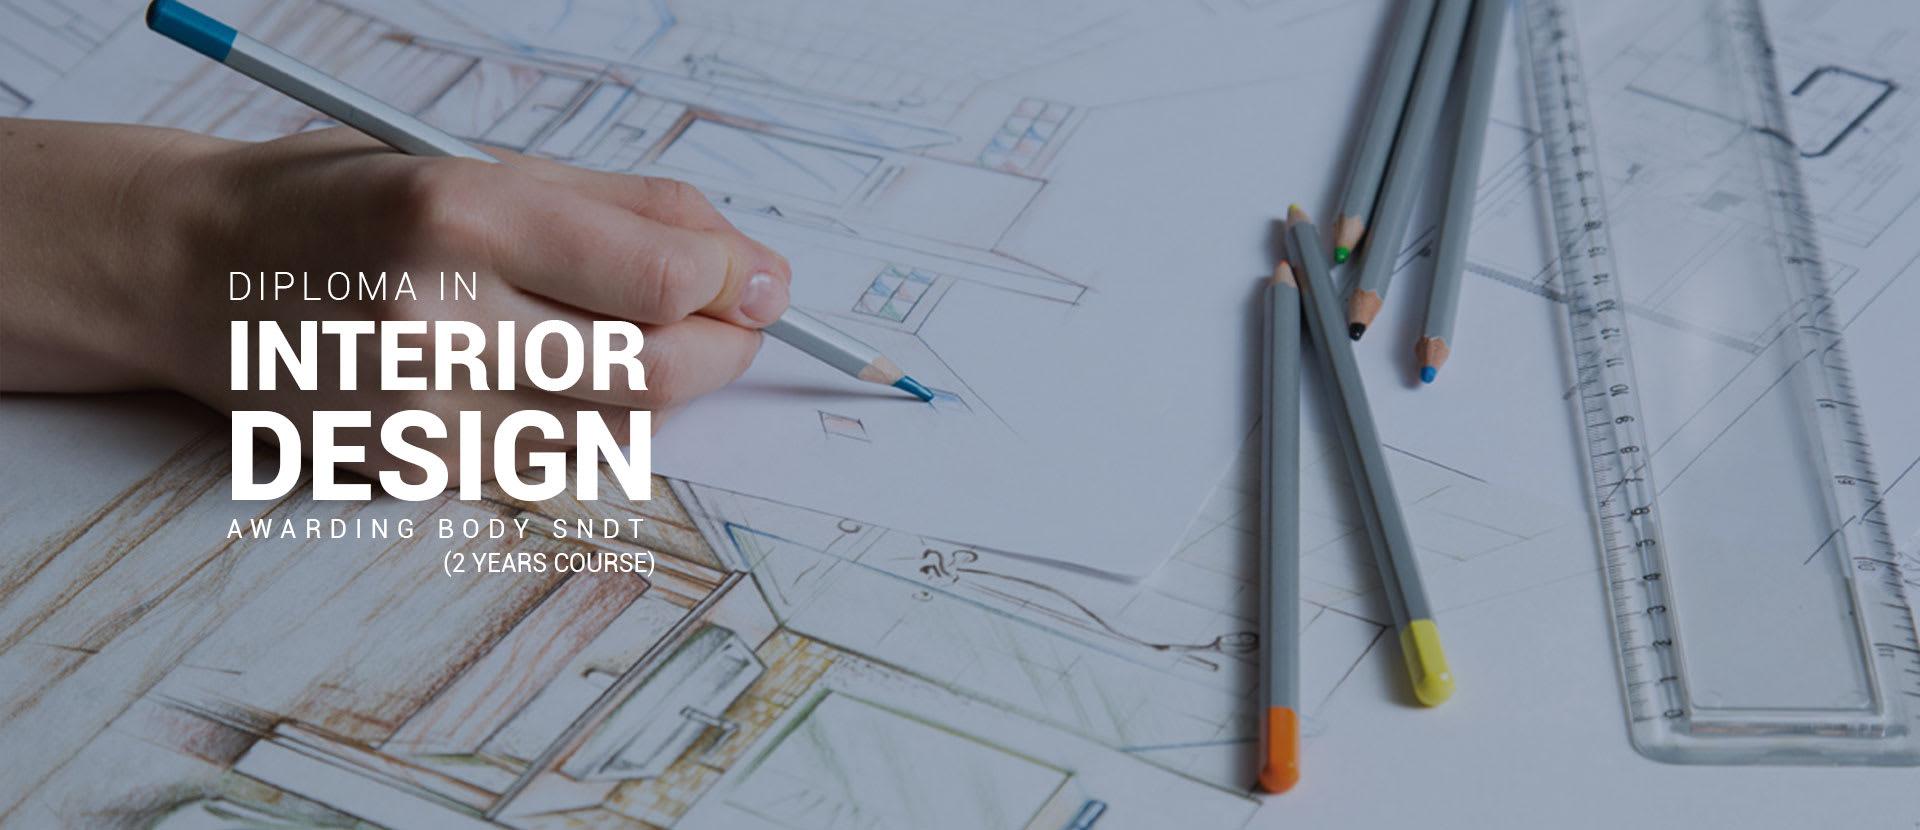 Diploma-in-Interior-Design-SNDT (1)